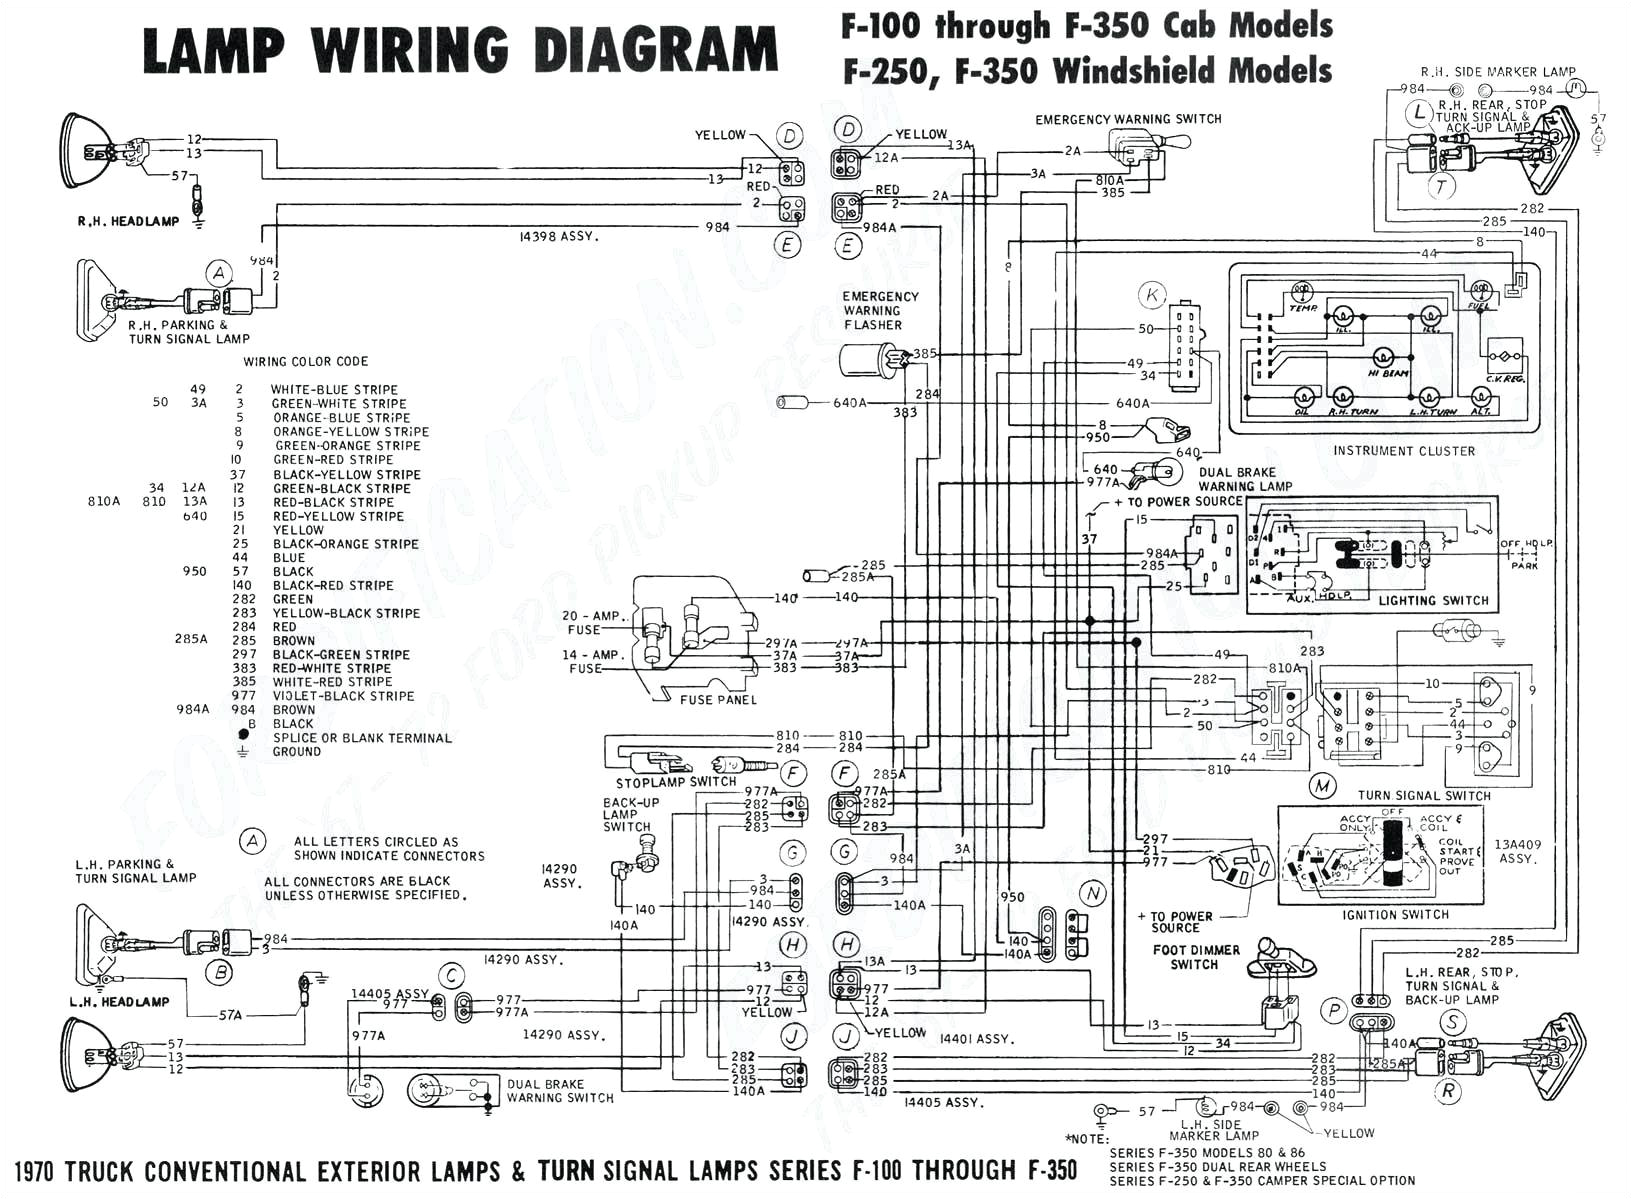 electric brake wiring diagram new 97 f150 trailer light wiring electrical wiring diagrams jpg